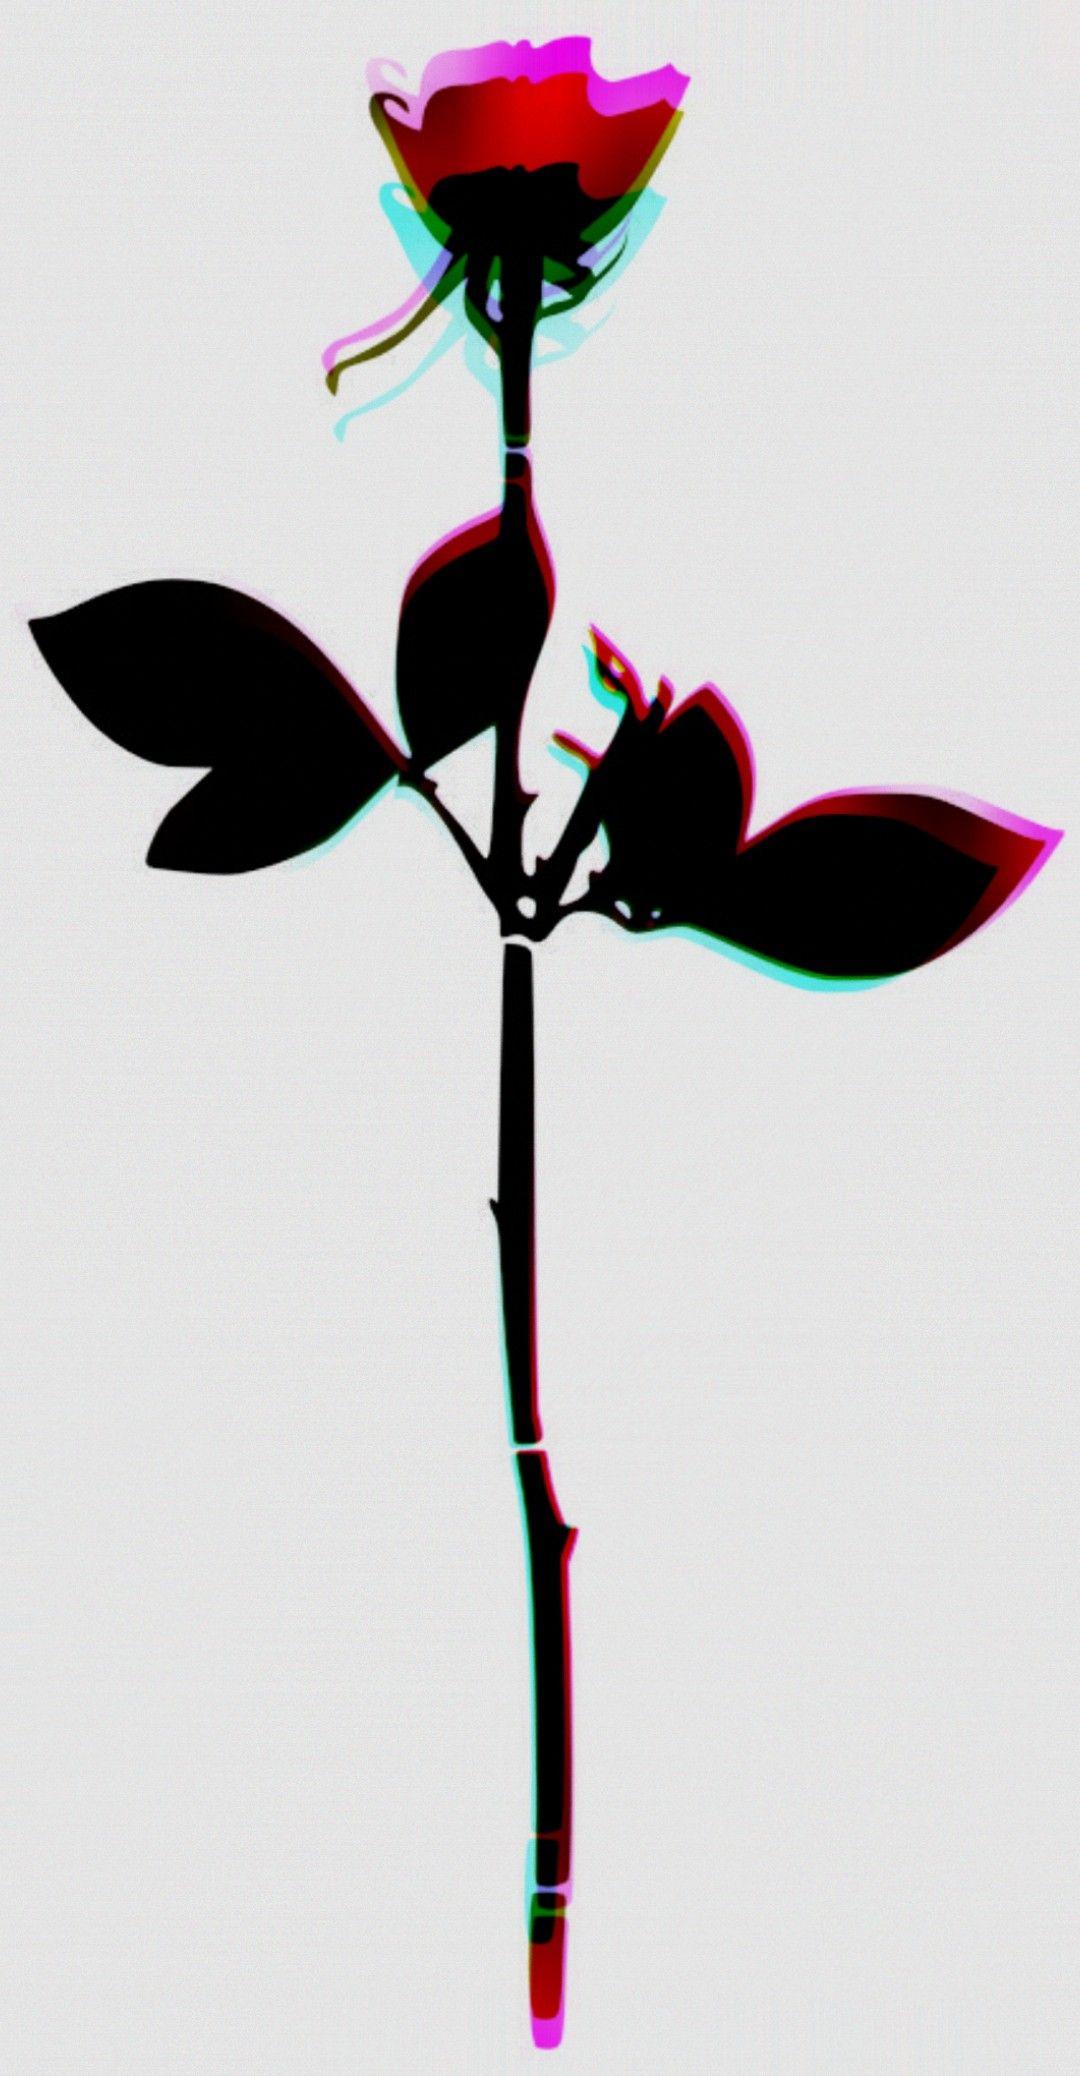 Devocion Devotion Music Tattoos Depeche Mode Dave Gahan